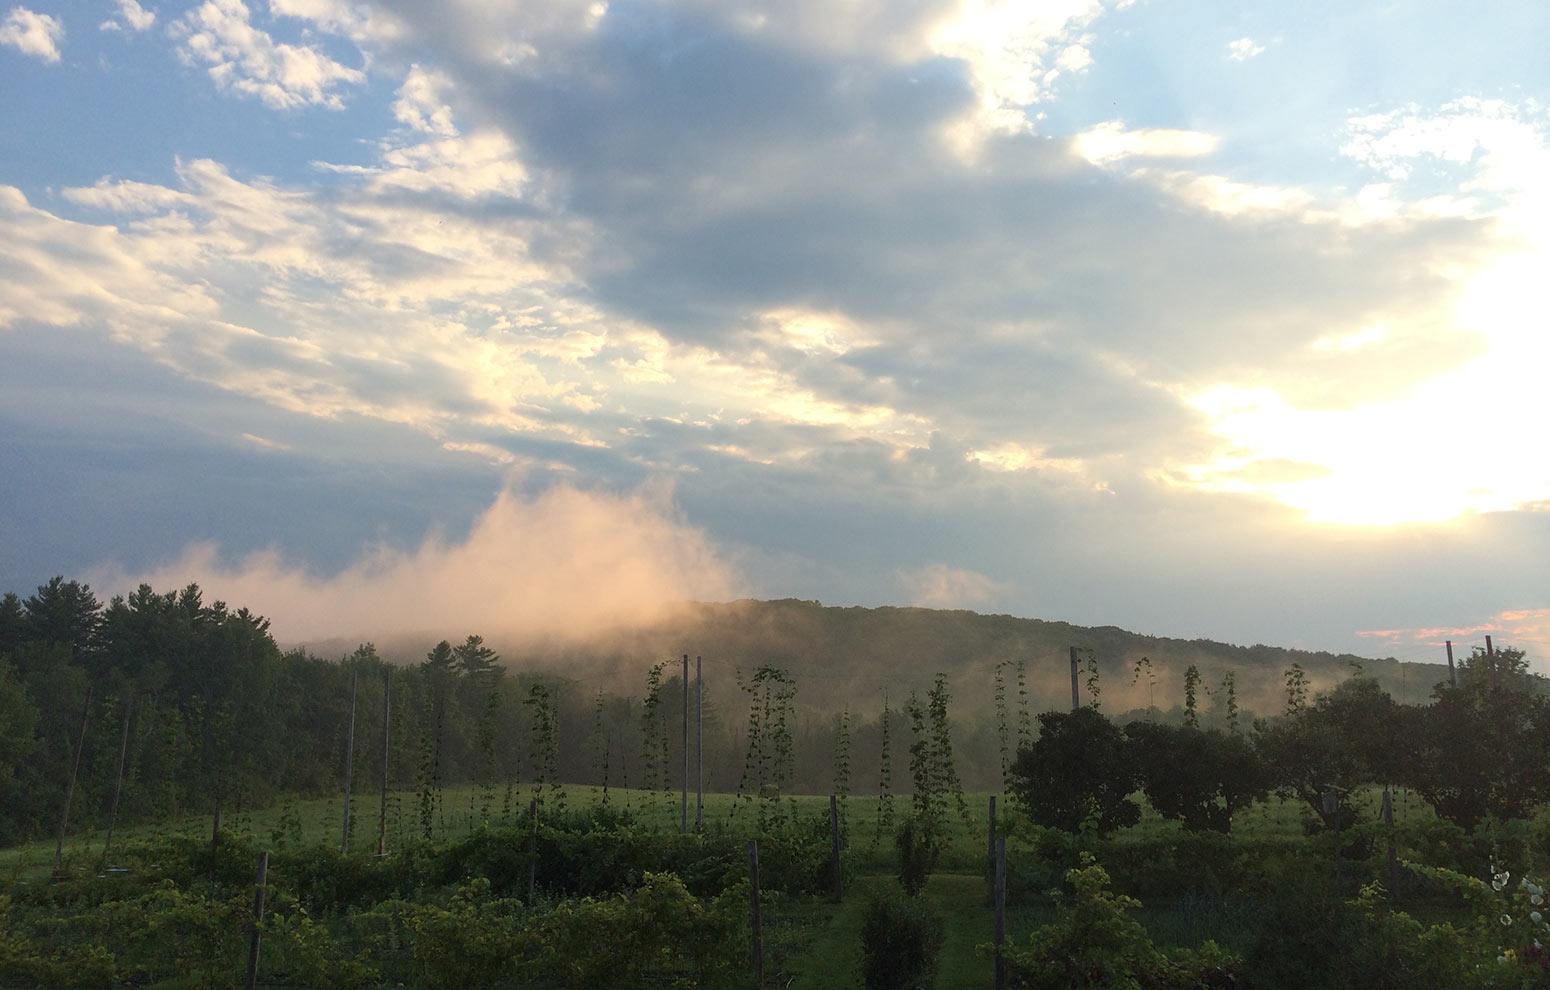 Hops on trellis in evening sunset mist